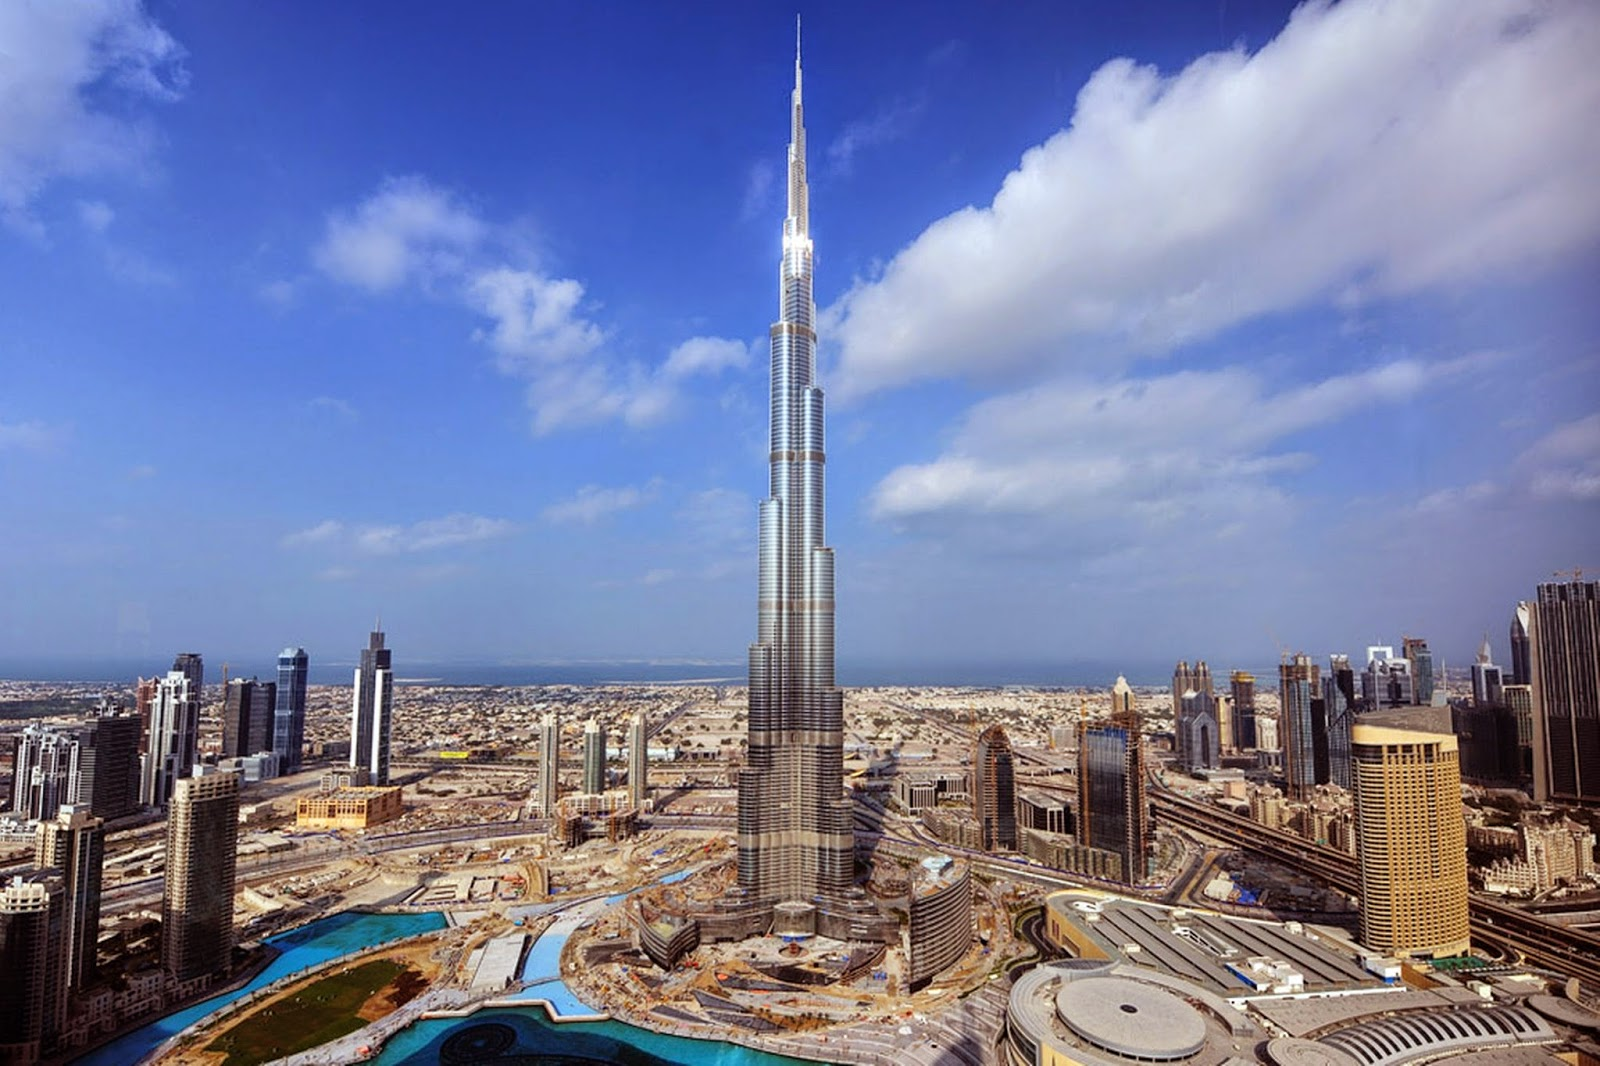 Burj Khalifa - Tallest man-made structure in the world in Dubai - myMinaret